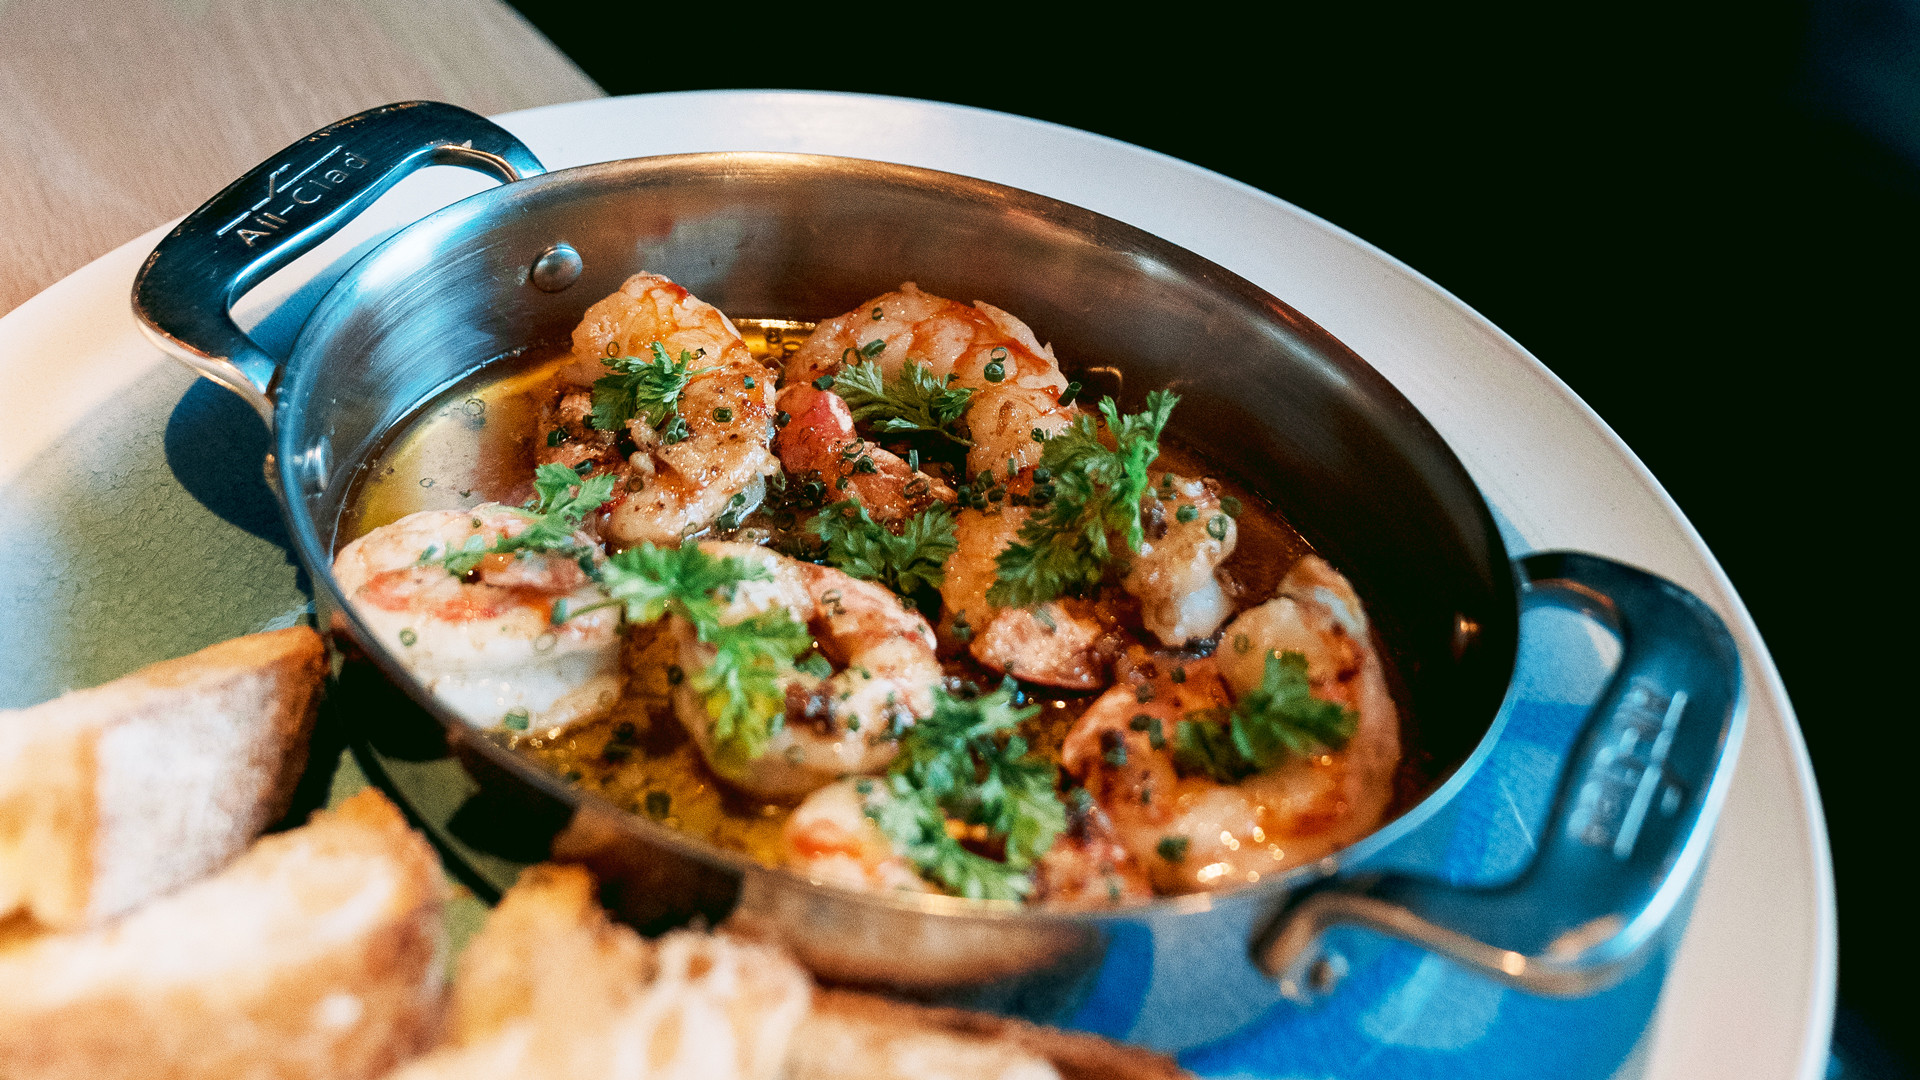 Bar Mignonette, Dundas West restaurant review | Garlic shrimp at Bar Mignonette